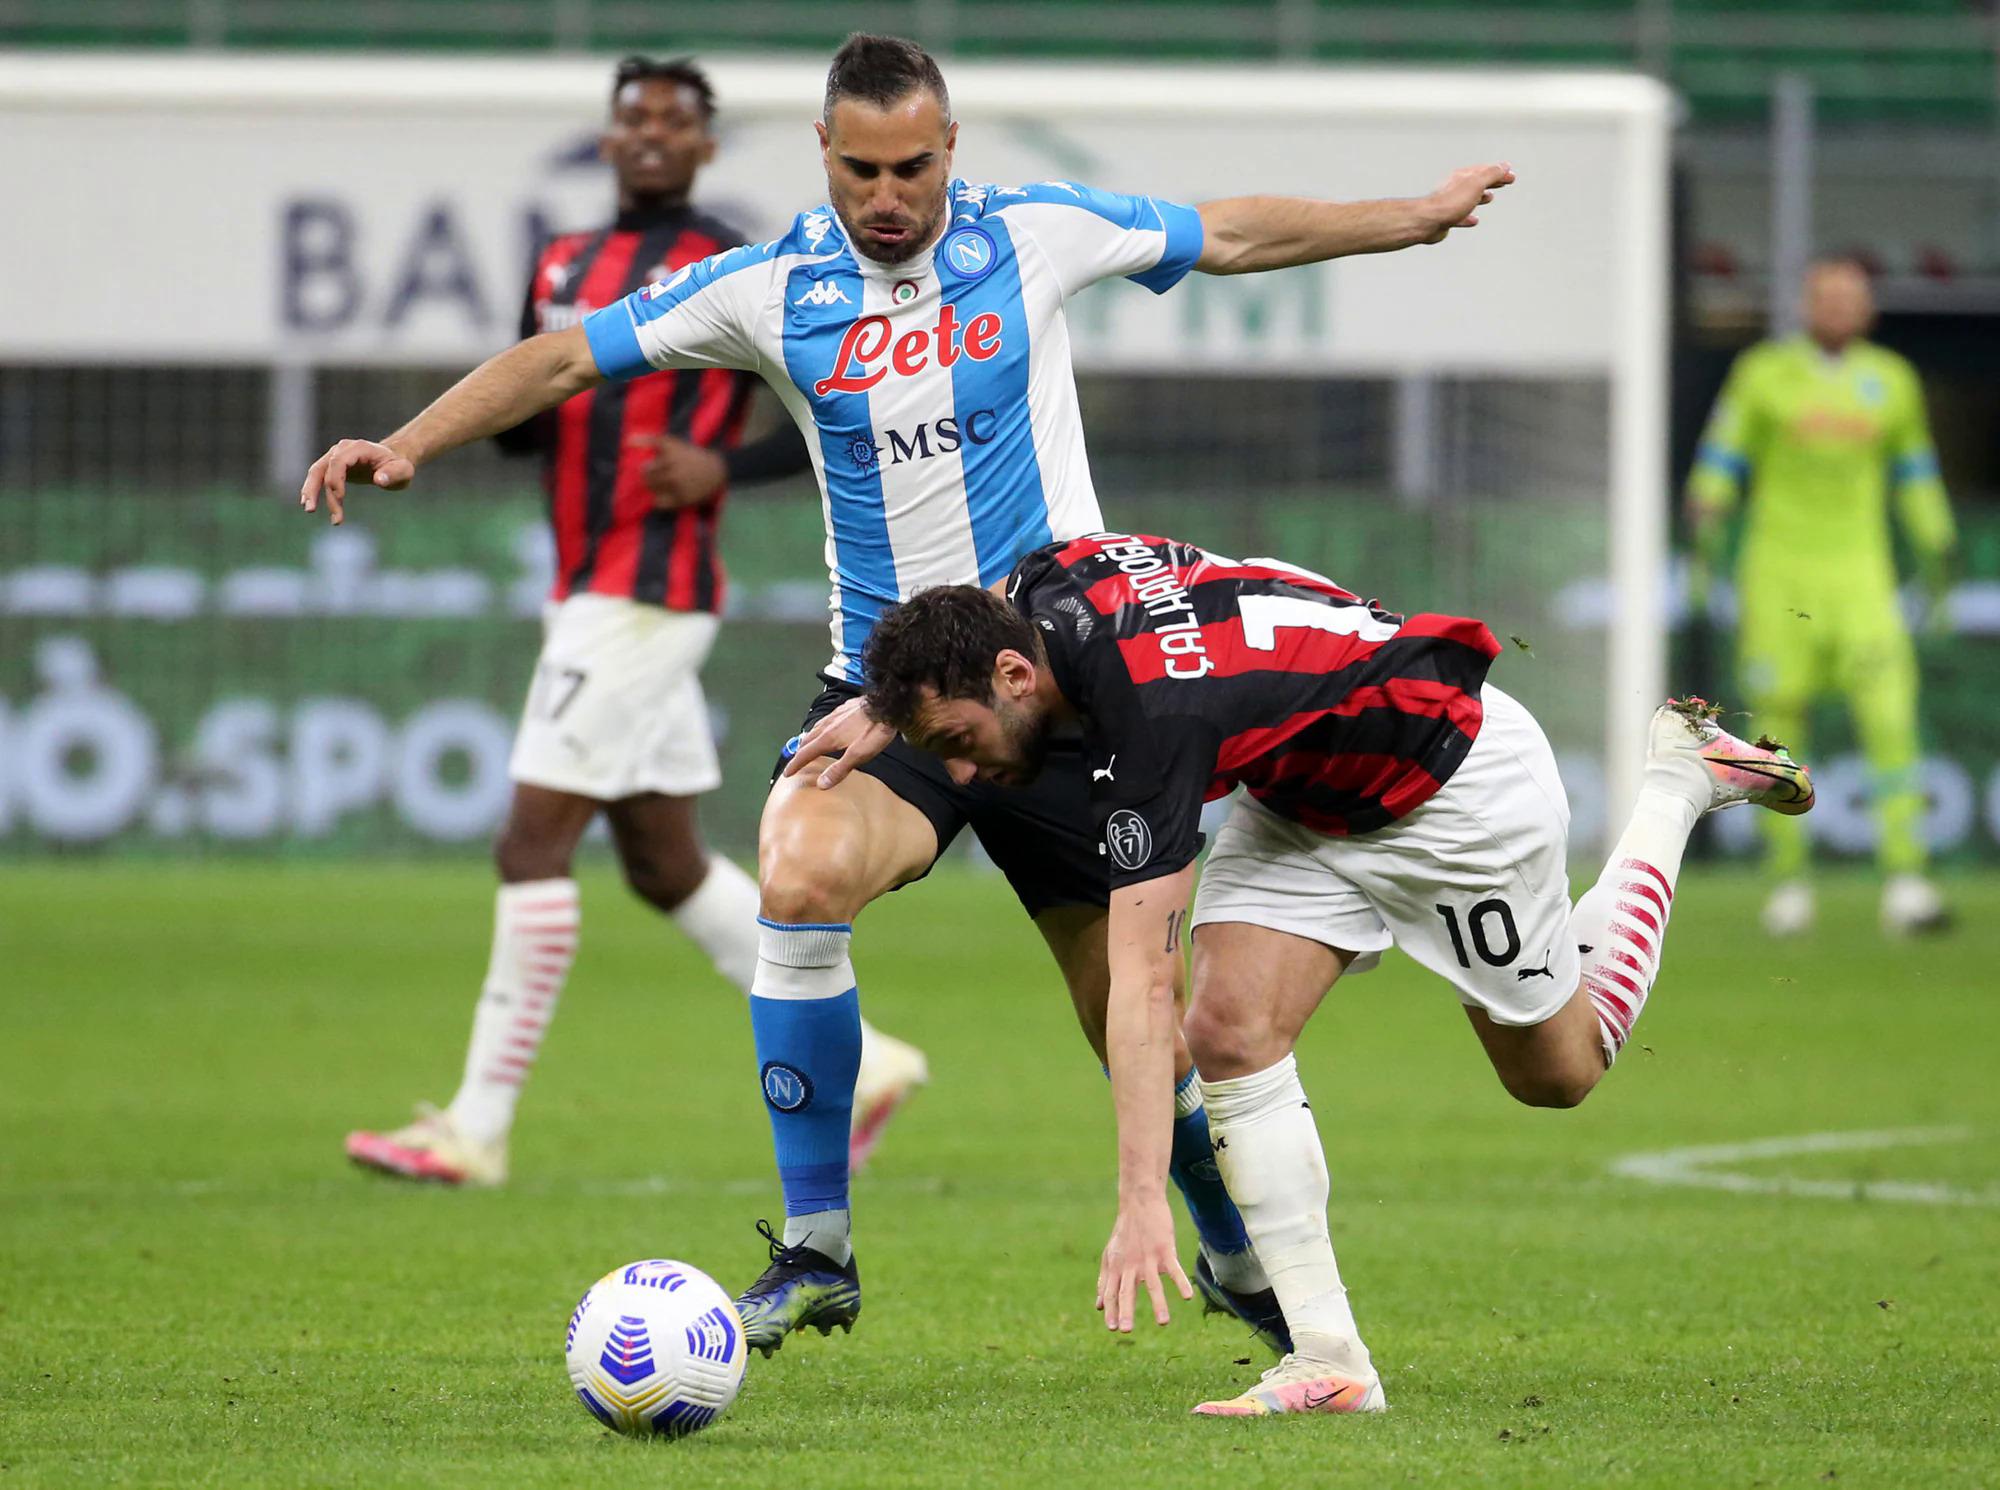 Kegagalan di kandang menyebabkan Milan ketinggalan dalam perburuan scudetto.  Foto: ANSA